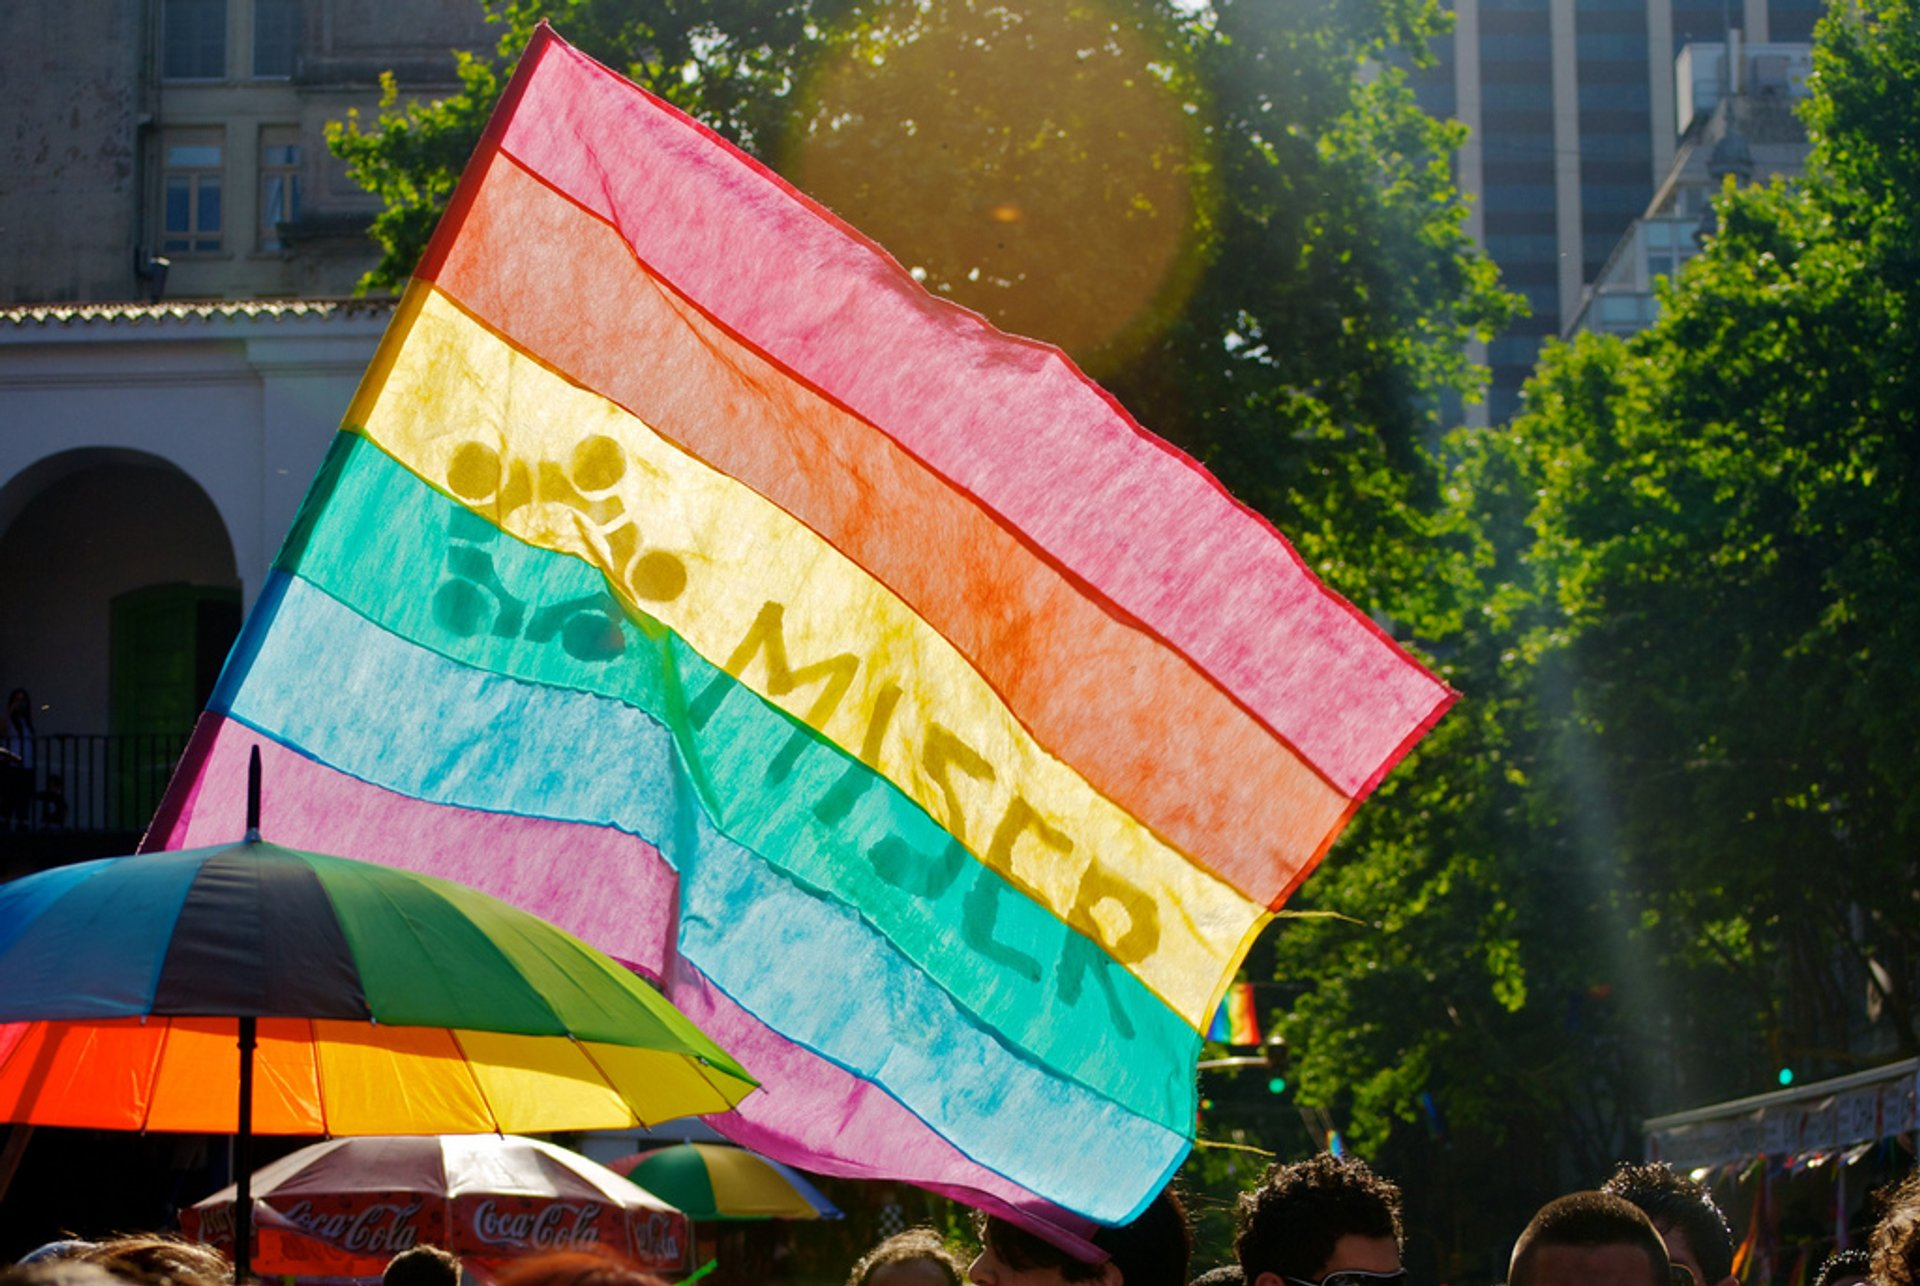 Marcha del Orgullo LGBTI (Buenos Aires Gay Pride) in Buenos Aires 2019 - Best Time